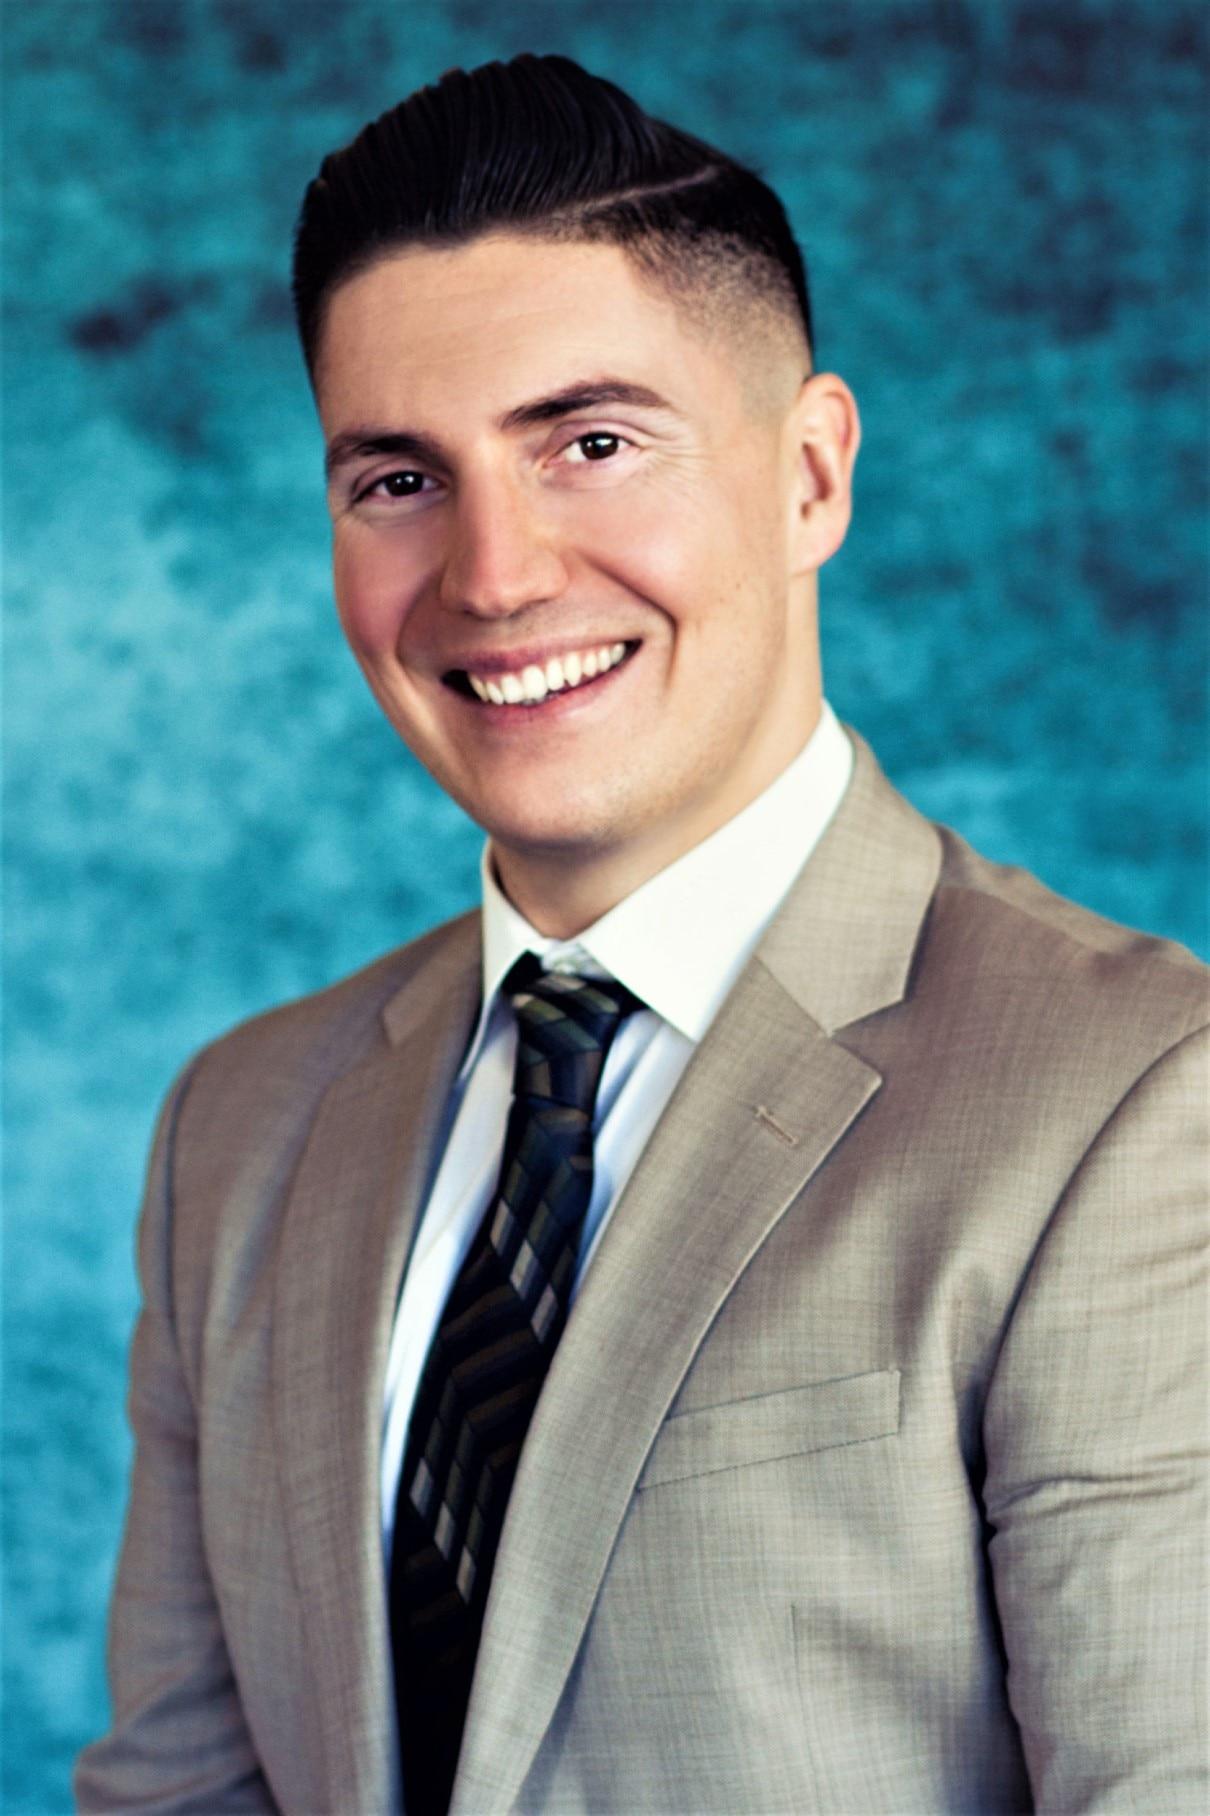 JOSEPH PENSABENE Financial Professional & Insurance Agent